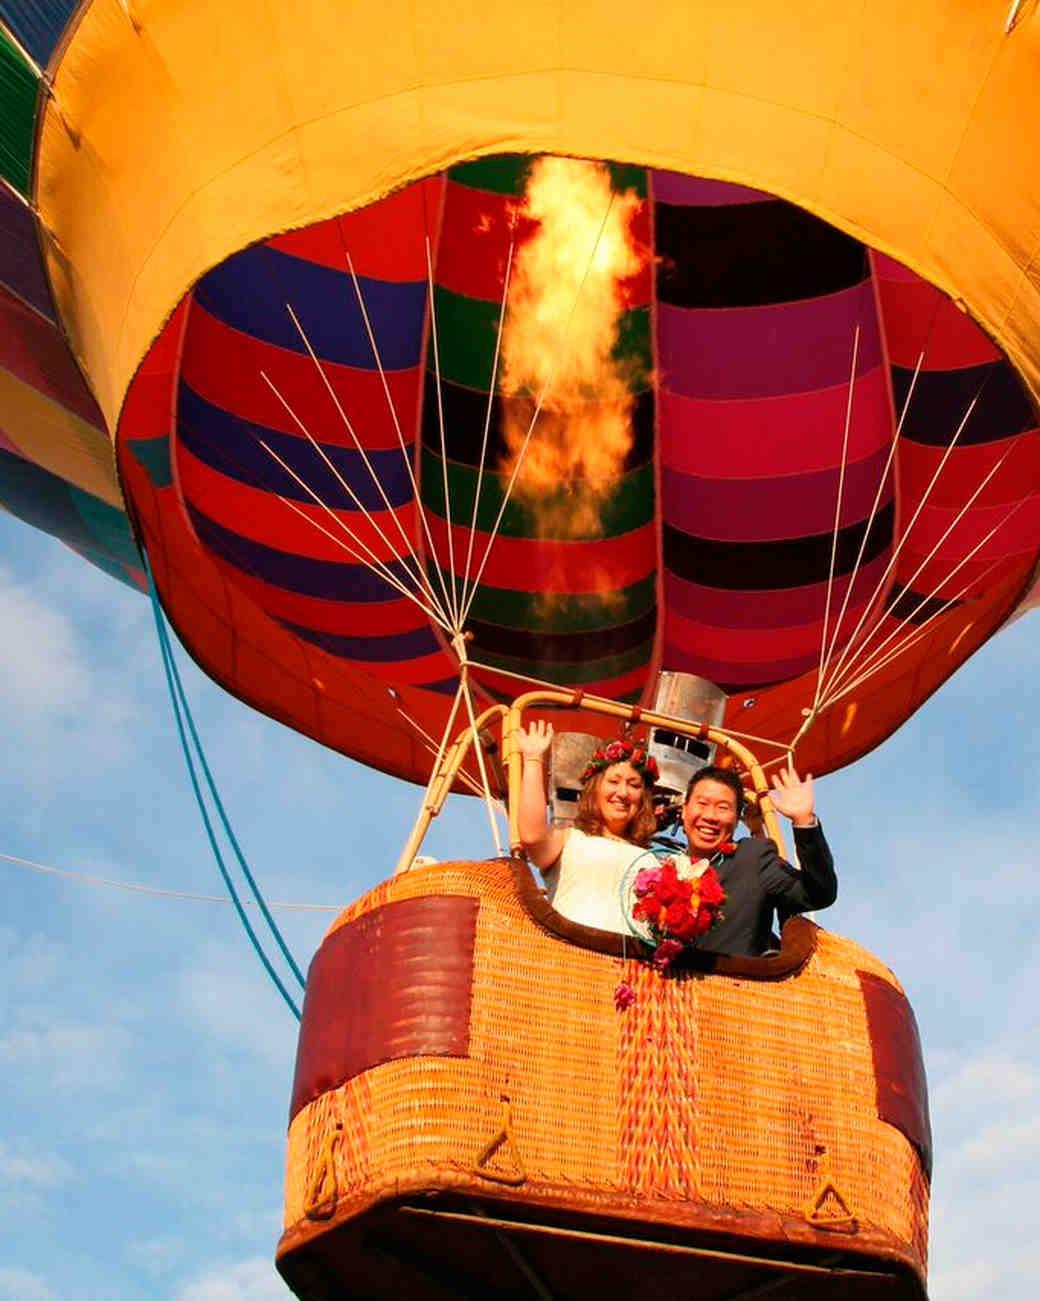 adventurous-ways-to-marry-asheville-hot-air-balloons-wedding-1215.jpg